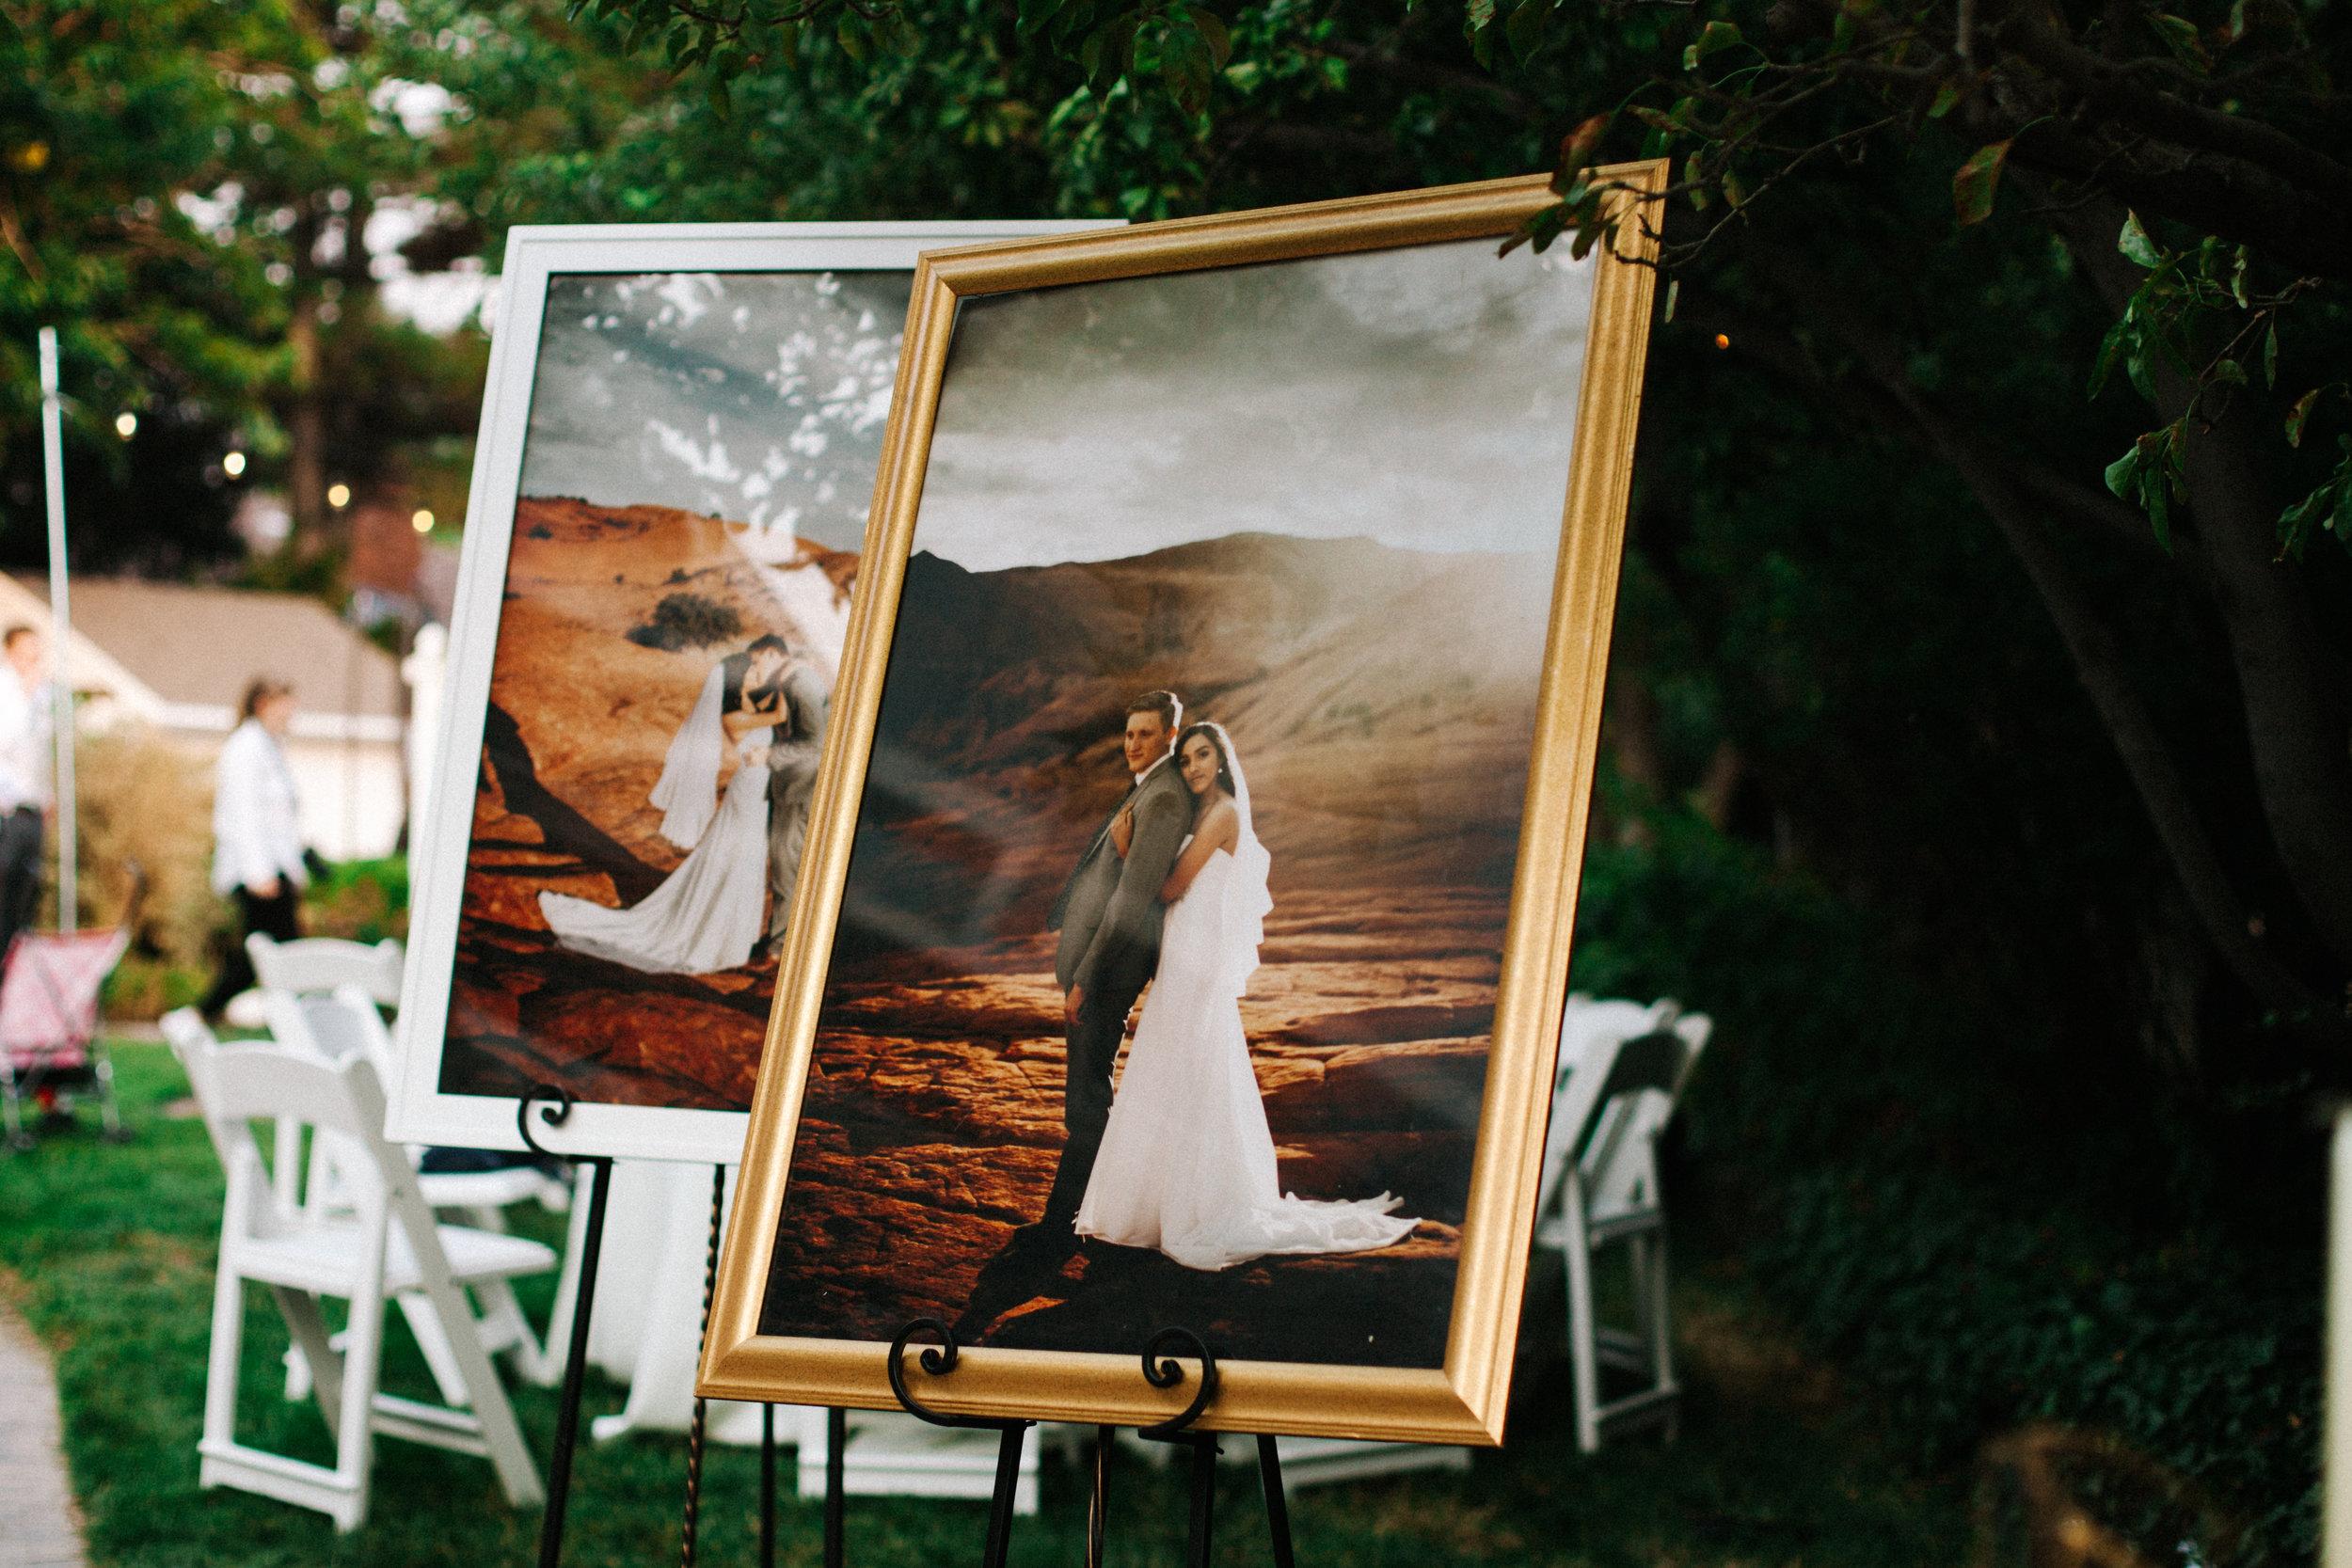 Wedding details, backyard wedding inspiration, wedding display inspiration, Salt Lake City wedding, Salt lake city wedding photographer, Utah wedding, Utah wedding photographer